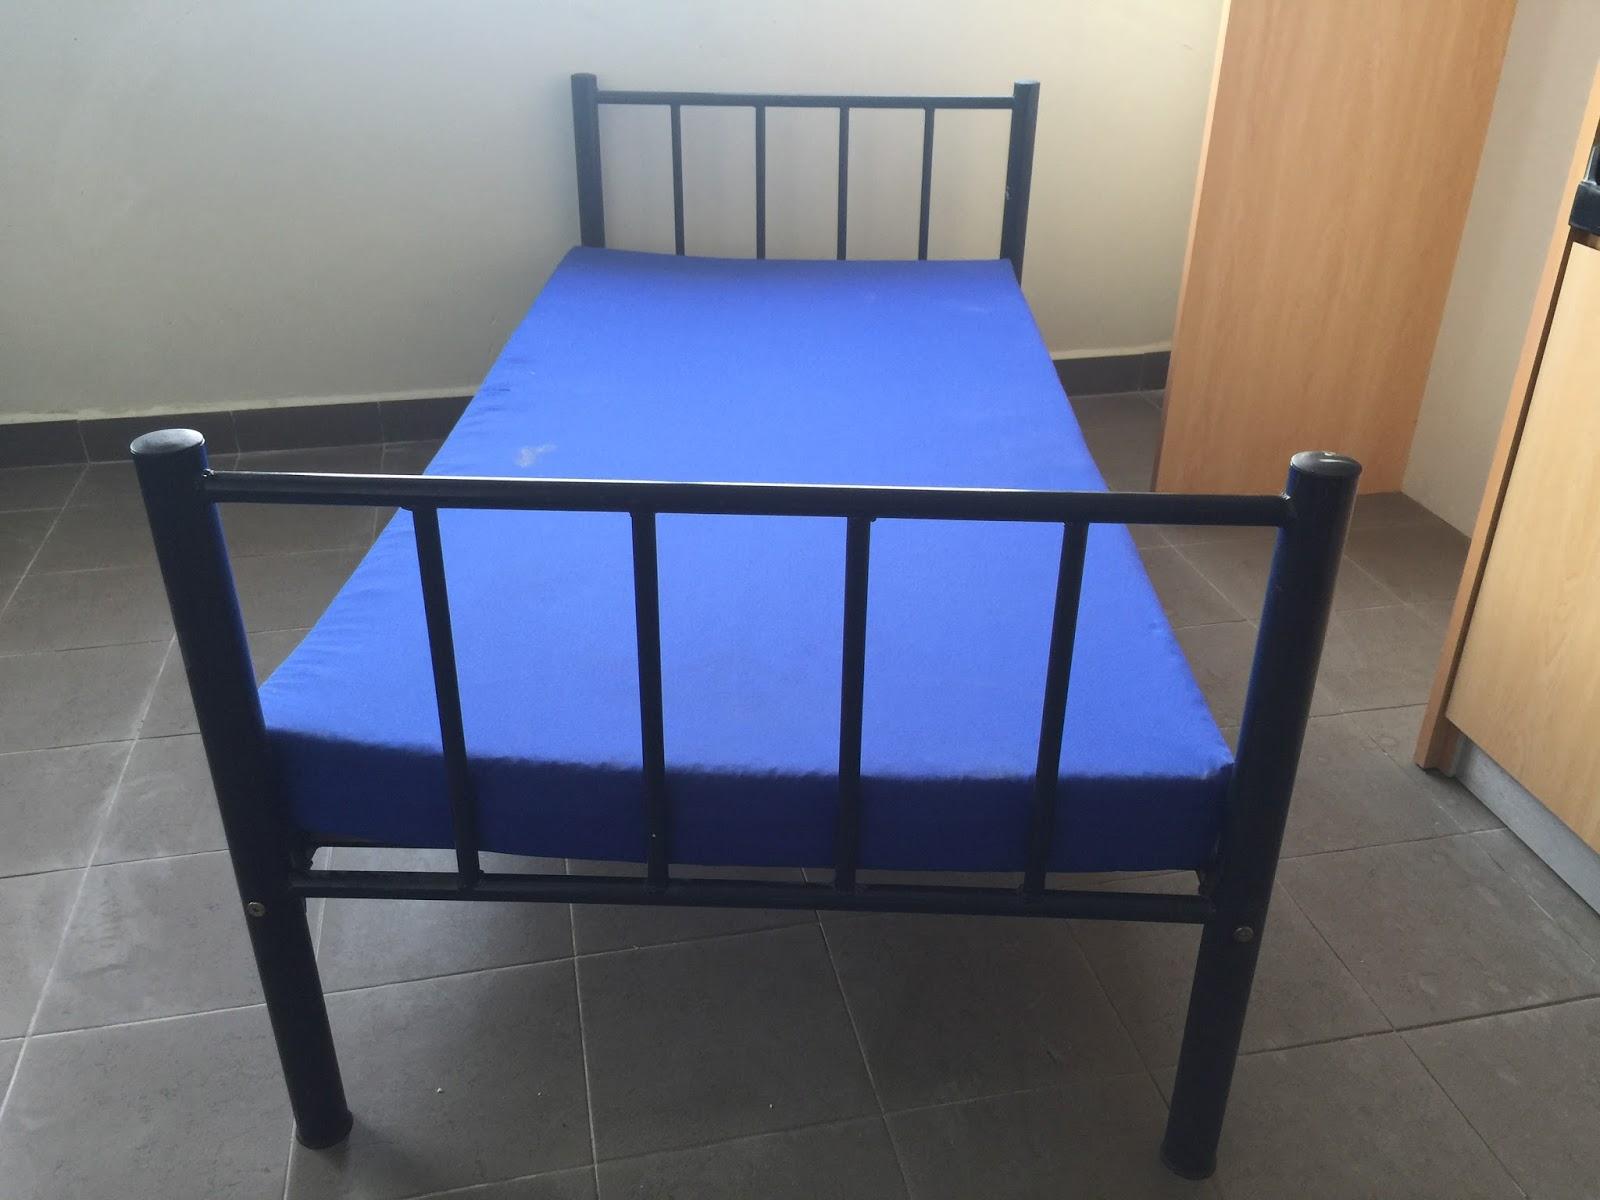 perabot terpakai katil single